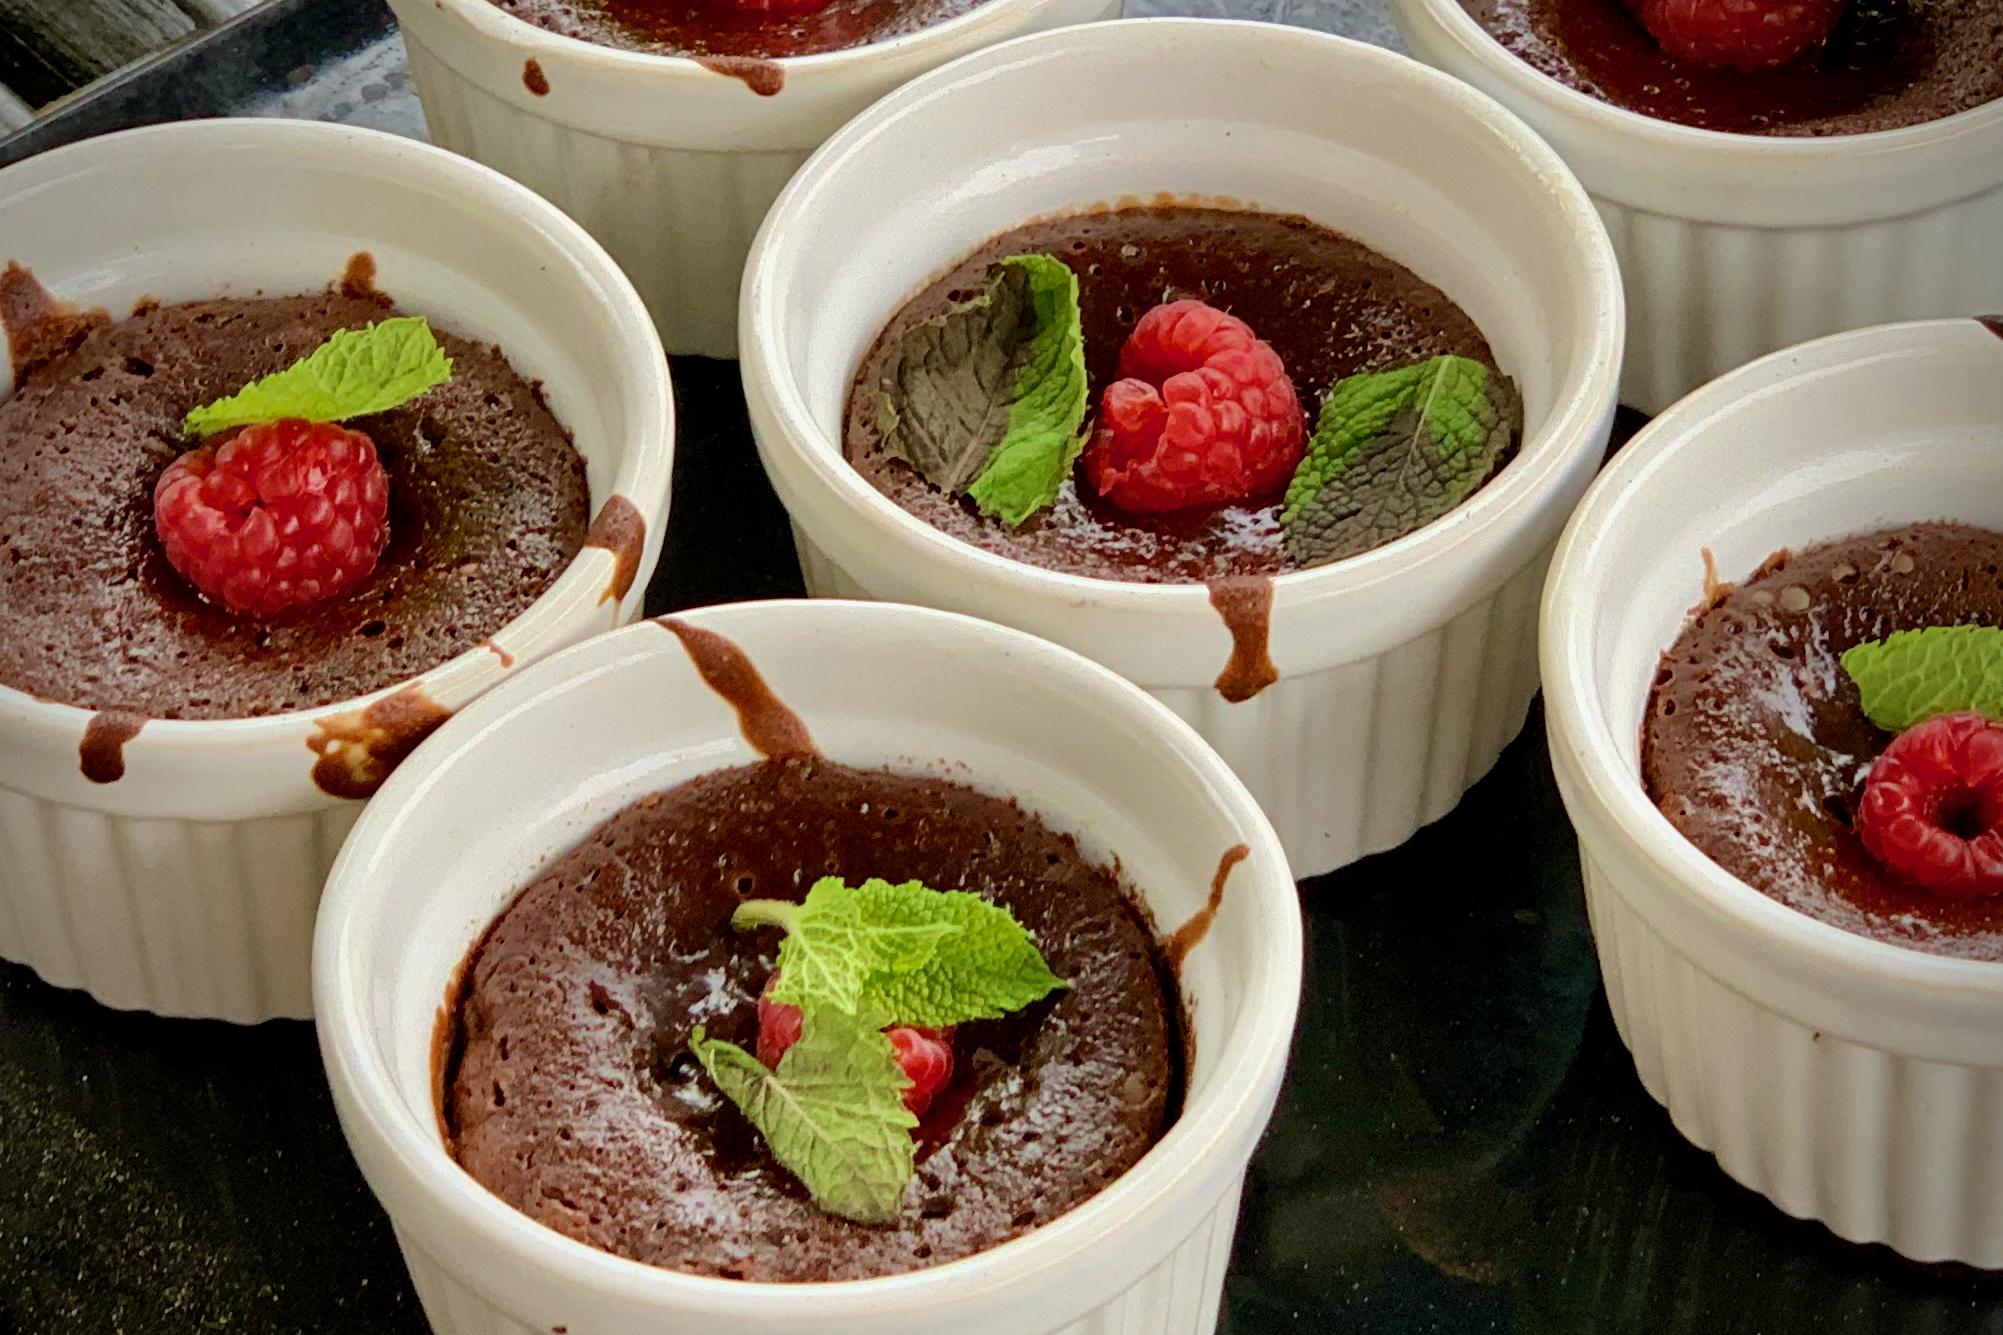 Gooey Chocolate Pudding